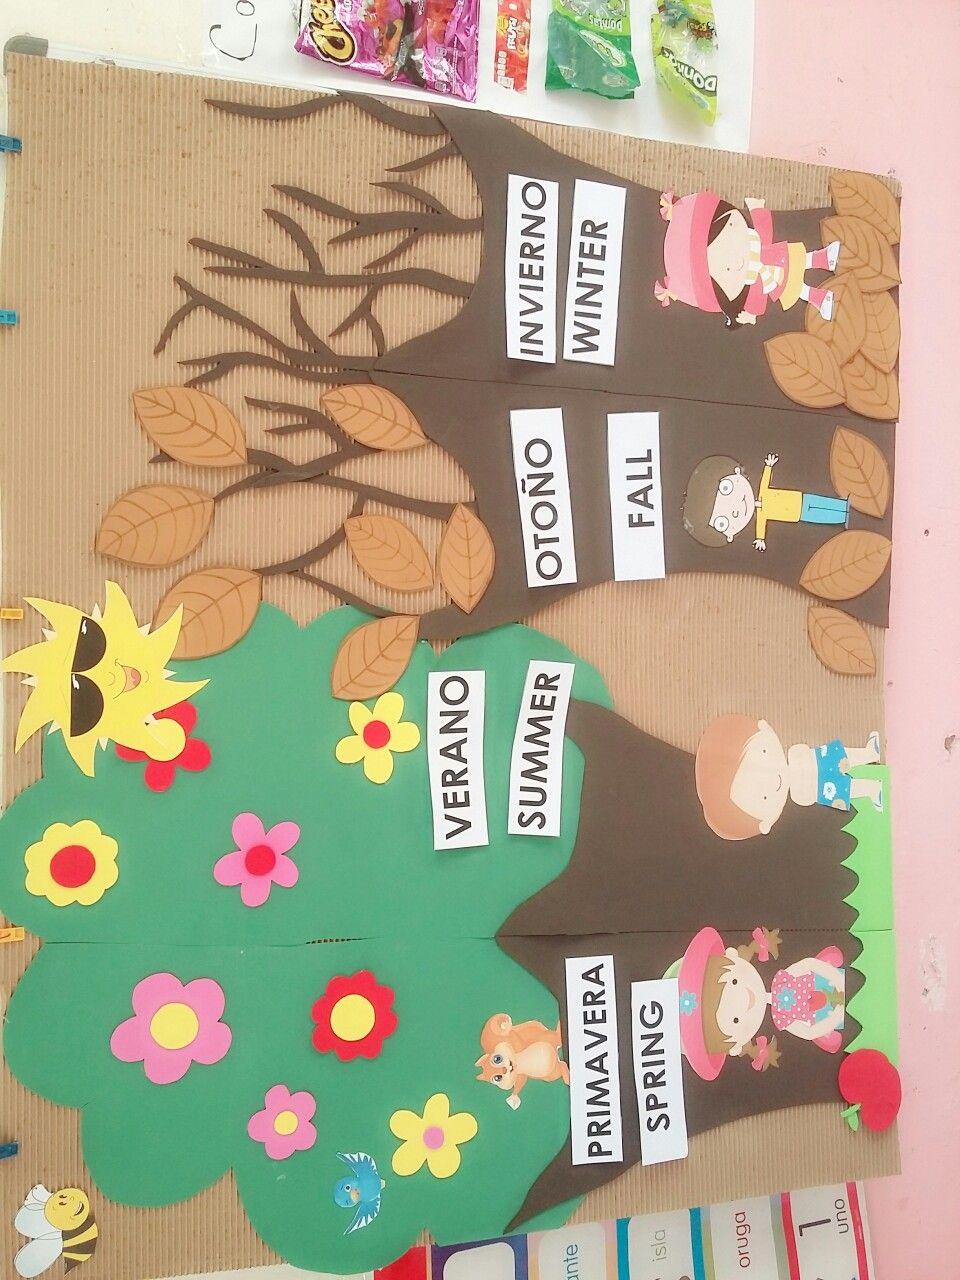 Estaciones de año (español e ingles) para preescolar